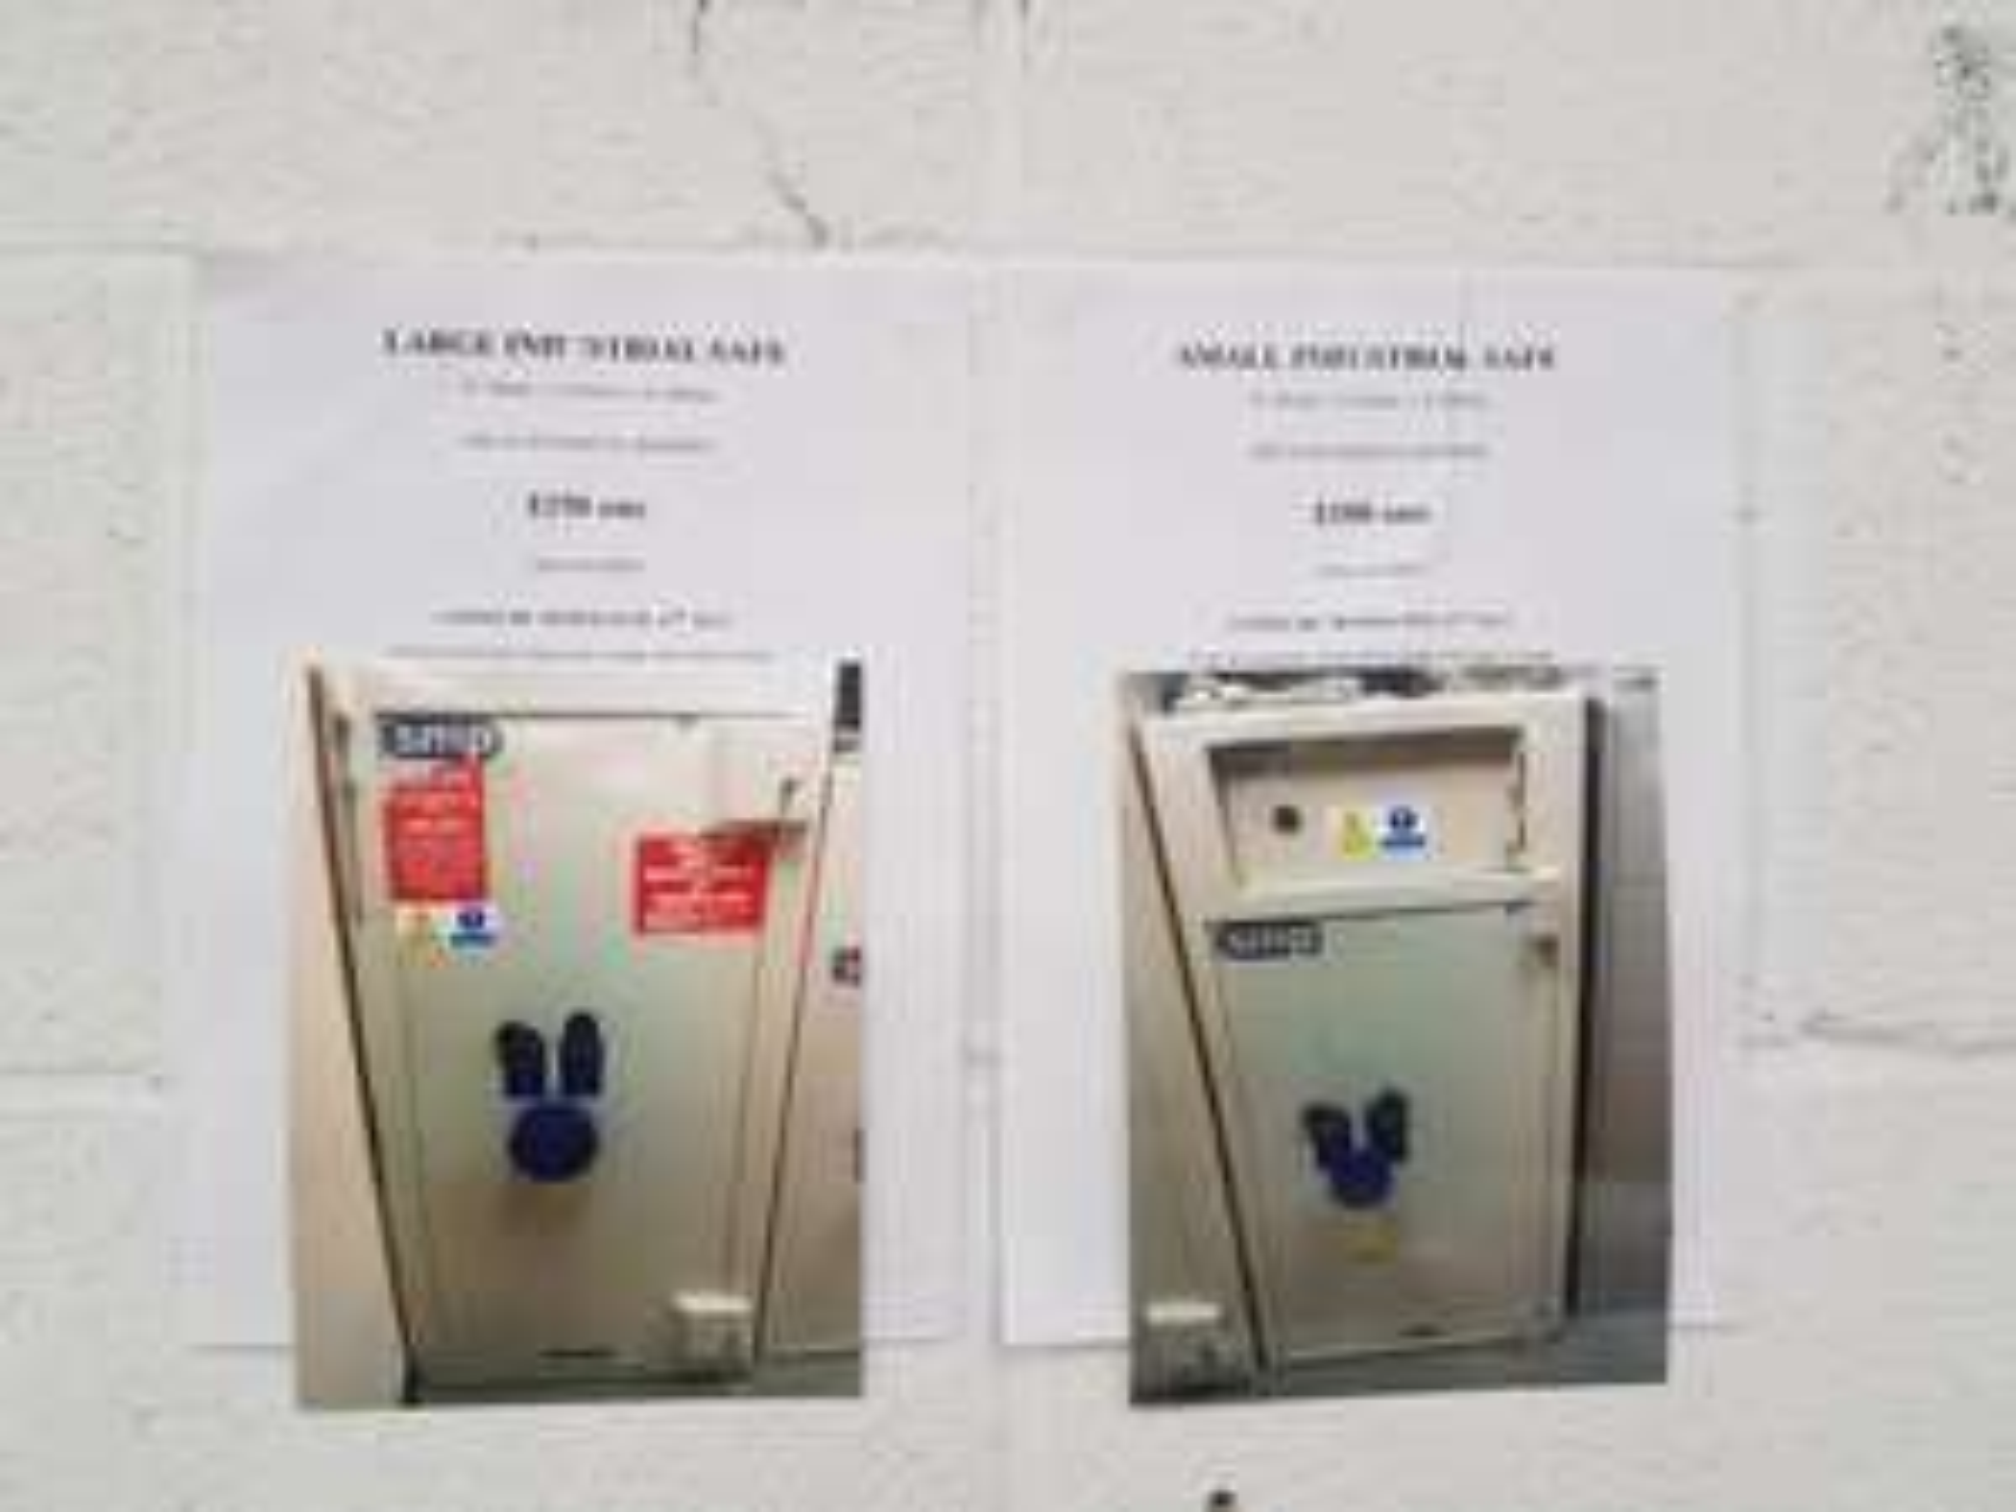 Industrial Safes (pre-owned)  - Homebase Instore (Spalding) - £100-150